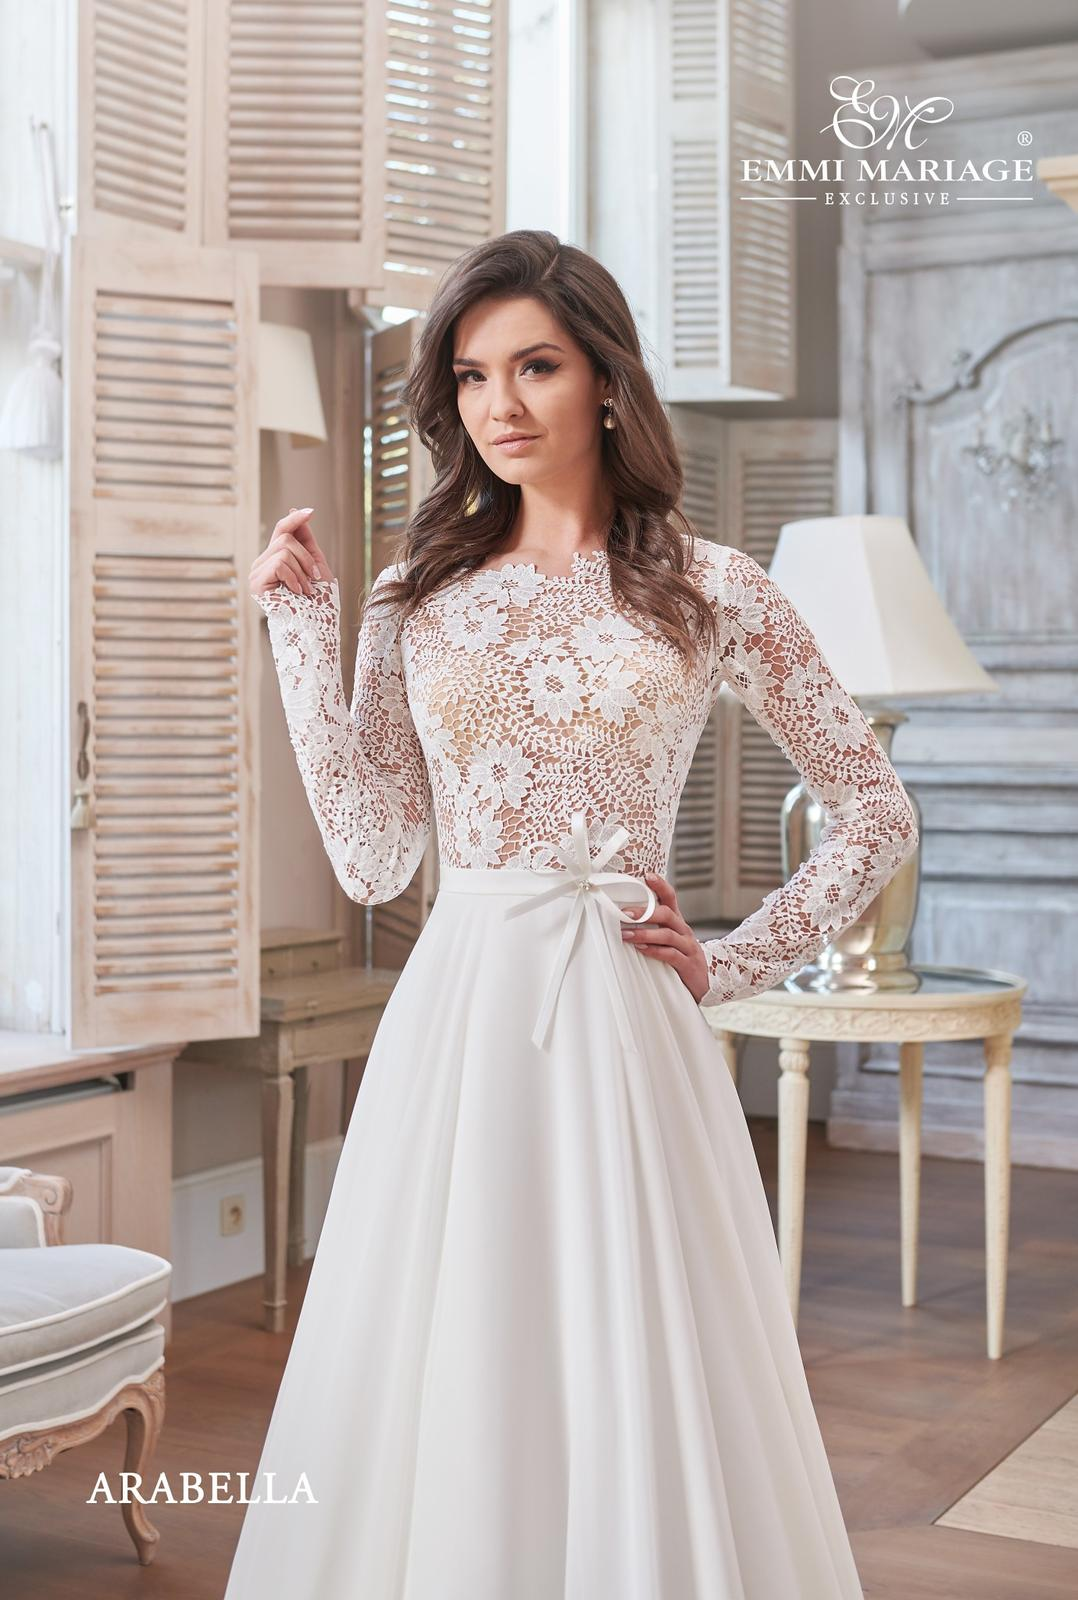 @aknajjanka Lehké, jednoduché šaty... - Obrázek č. 1